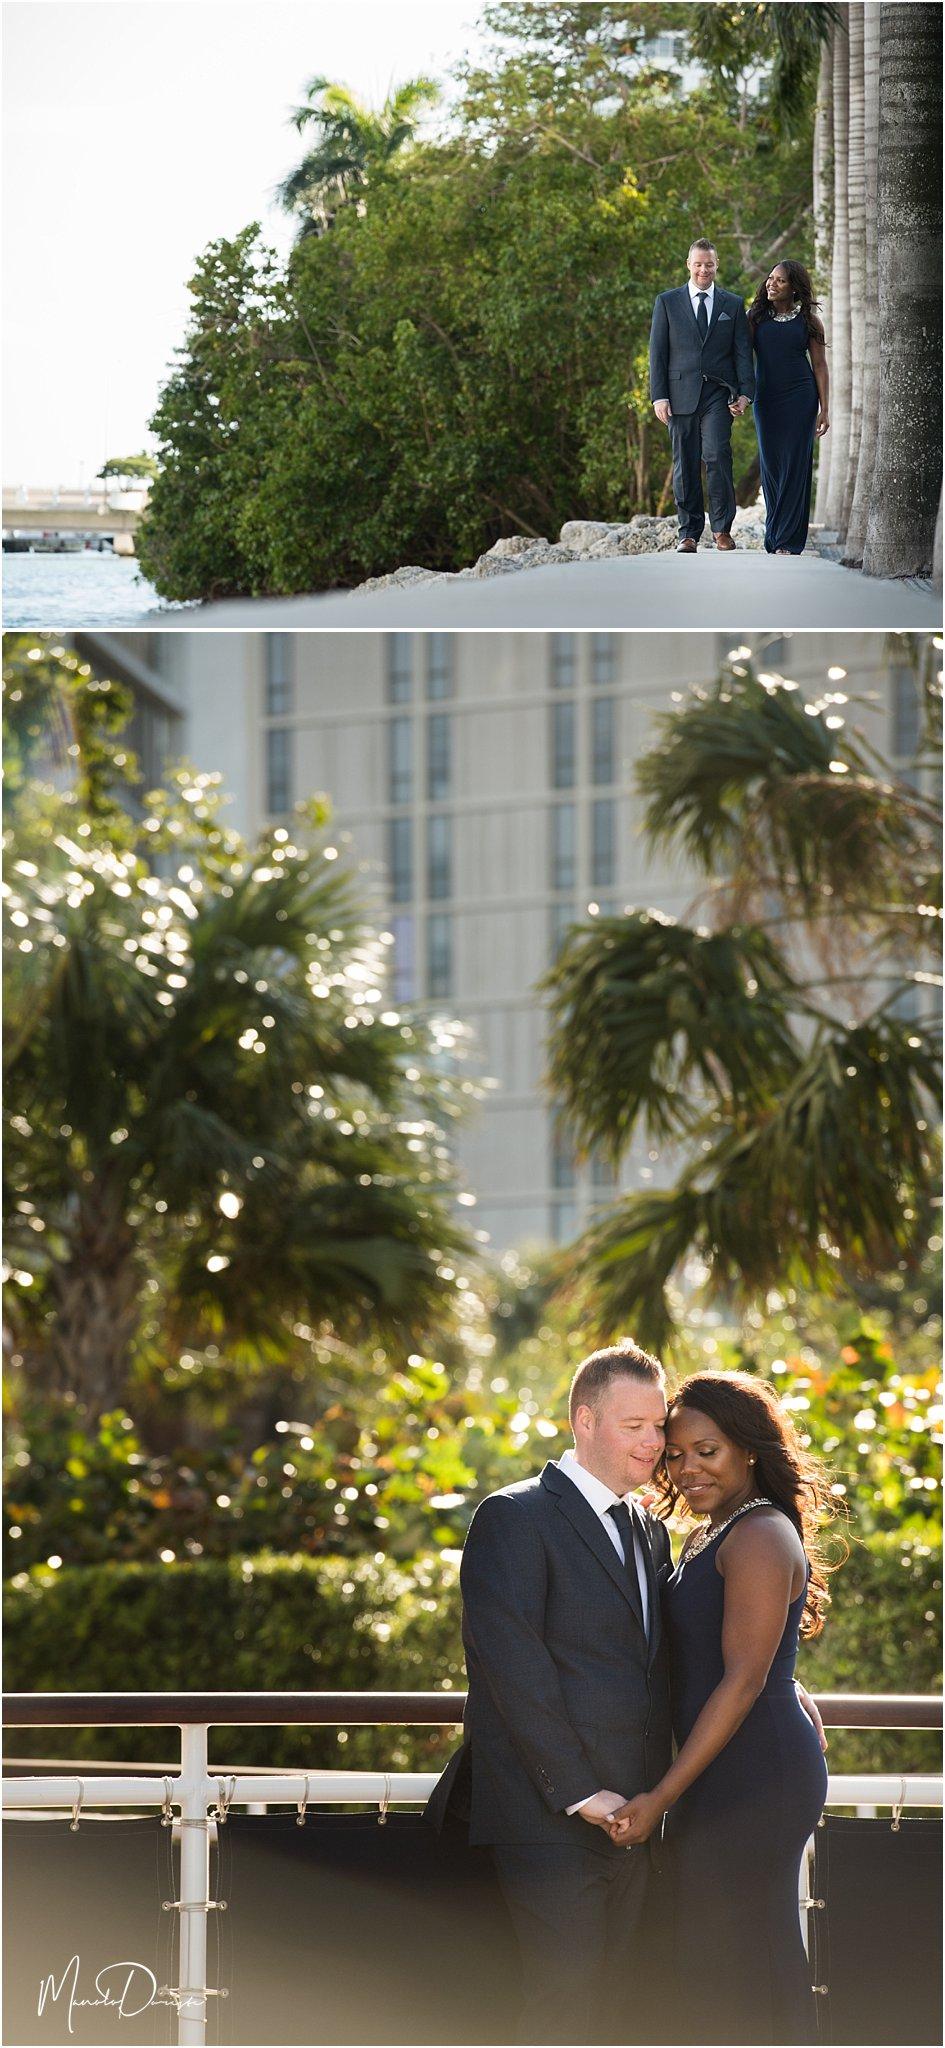 0707_ManoloDoreste_InFocusStudios_Wedding_Family_Photography_Miami_MiamiPhotographer.jpg